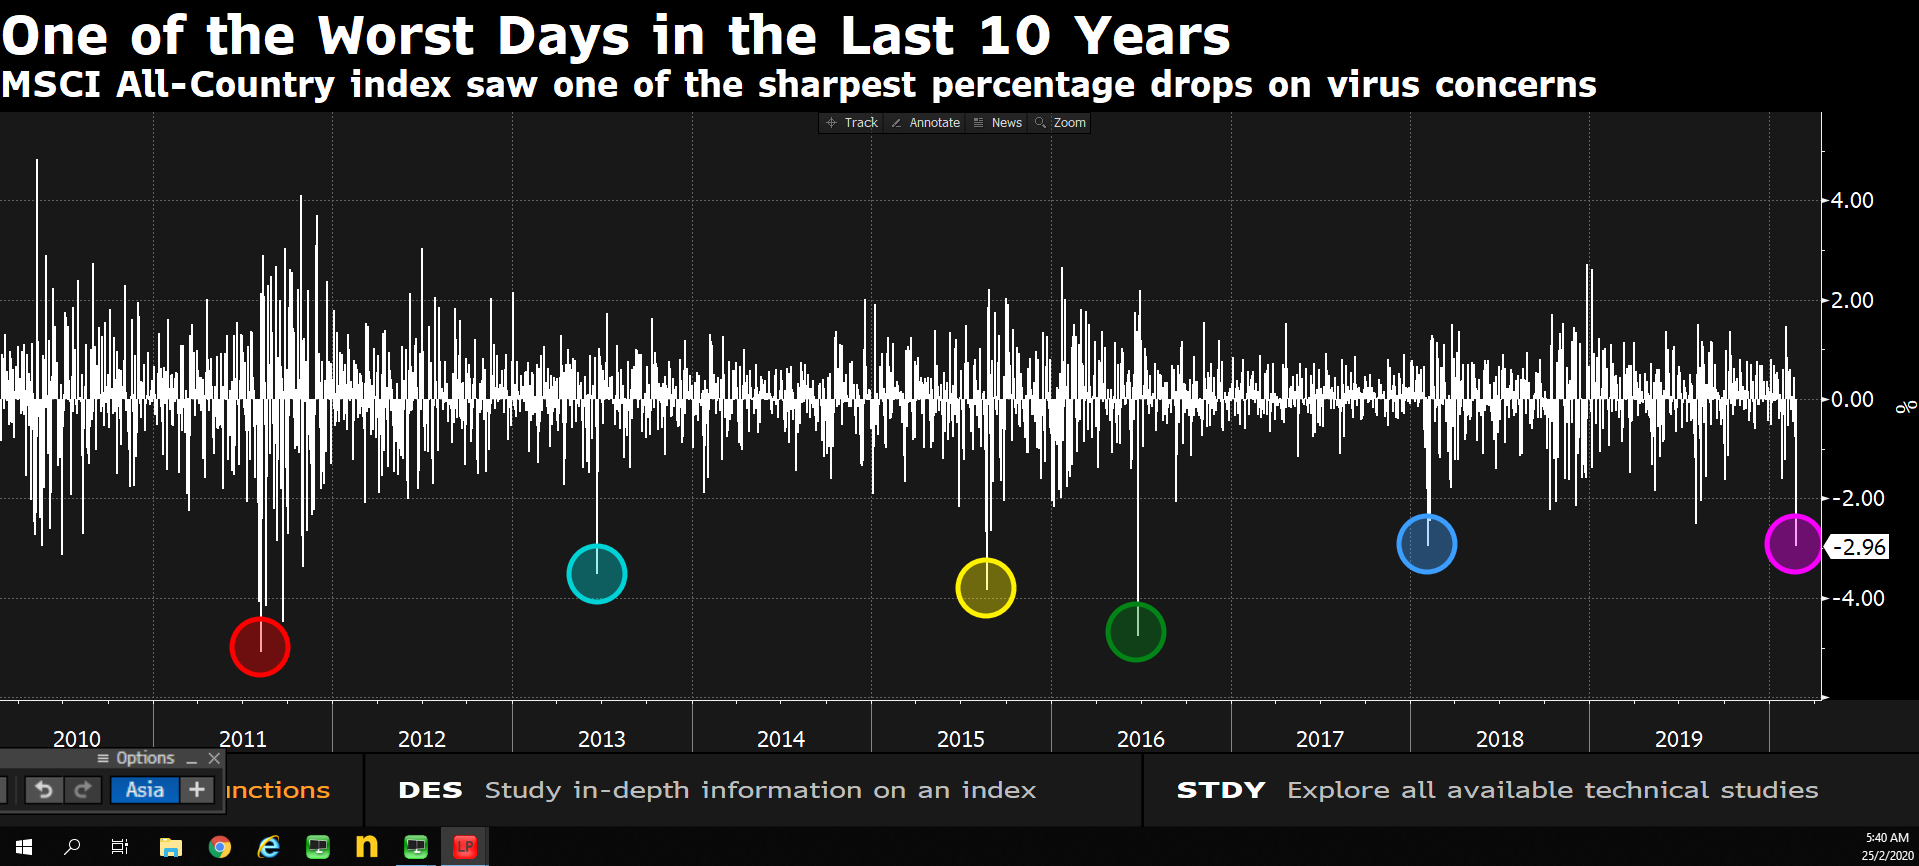 Piores dias no mercado nos últimos 10 anos